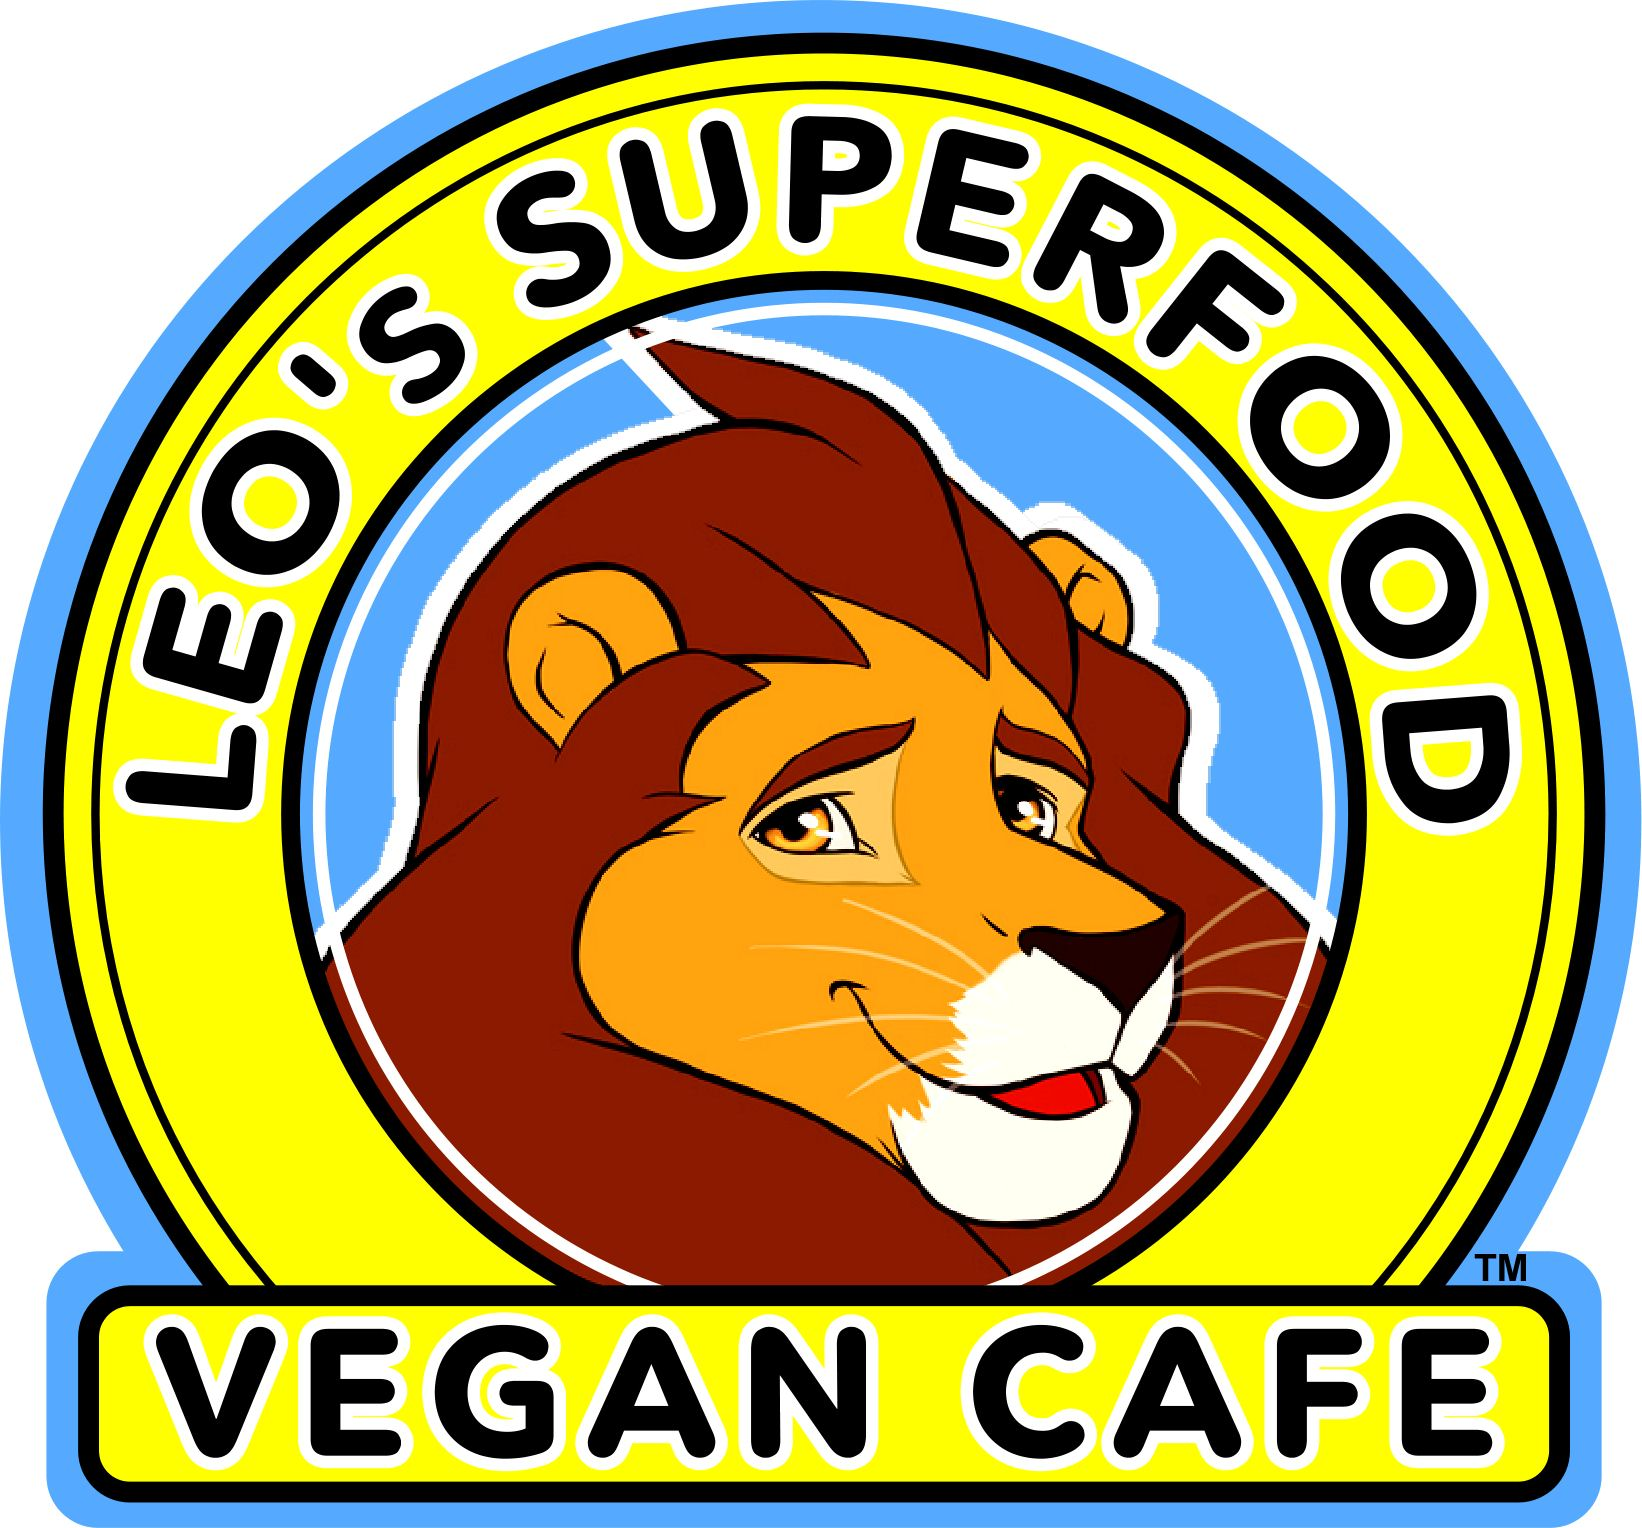 Leo's Superfood Vegan Cafe